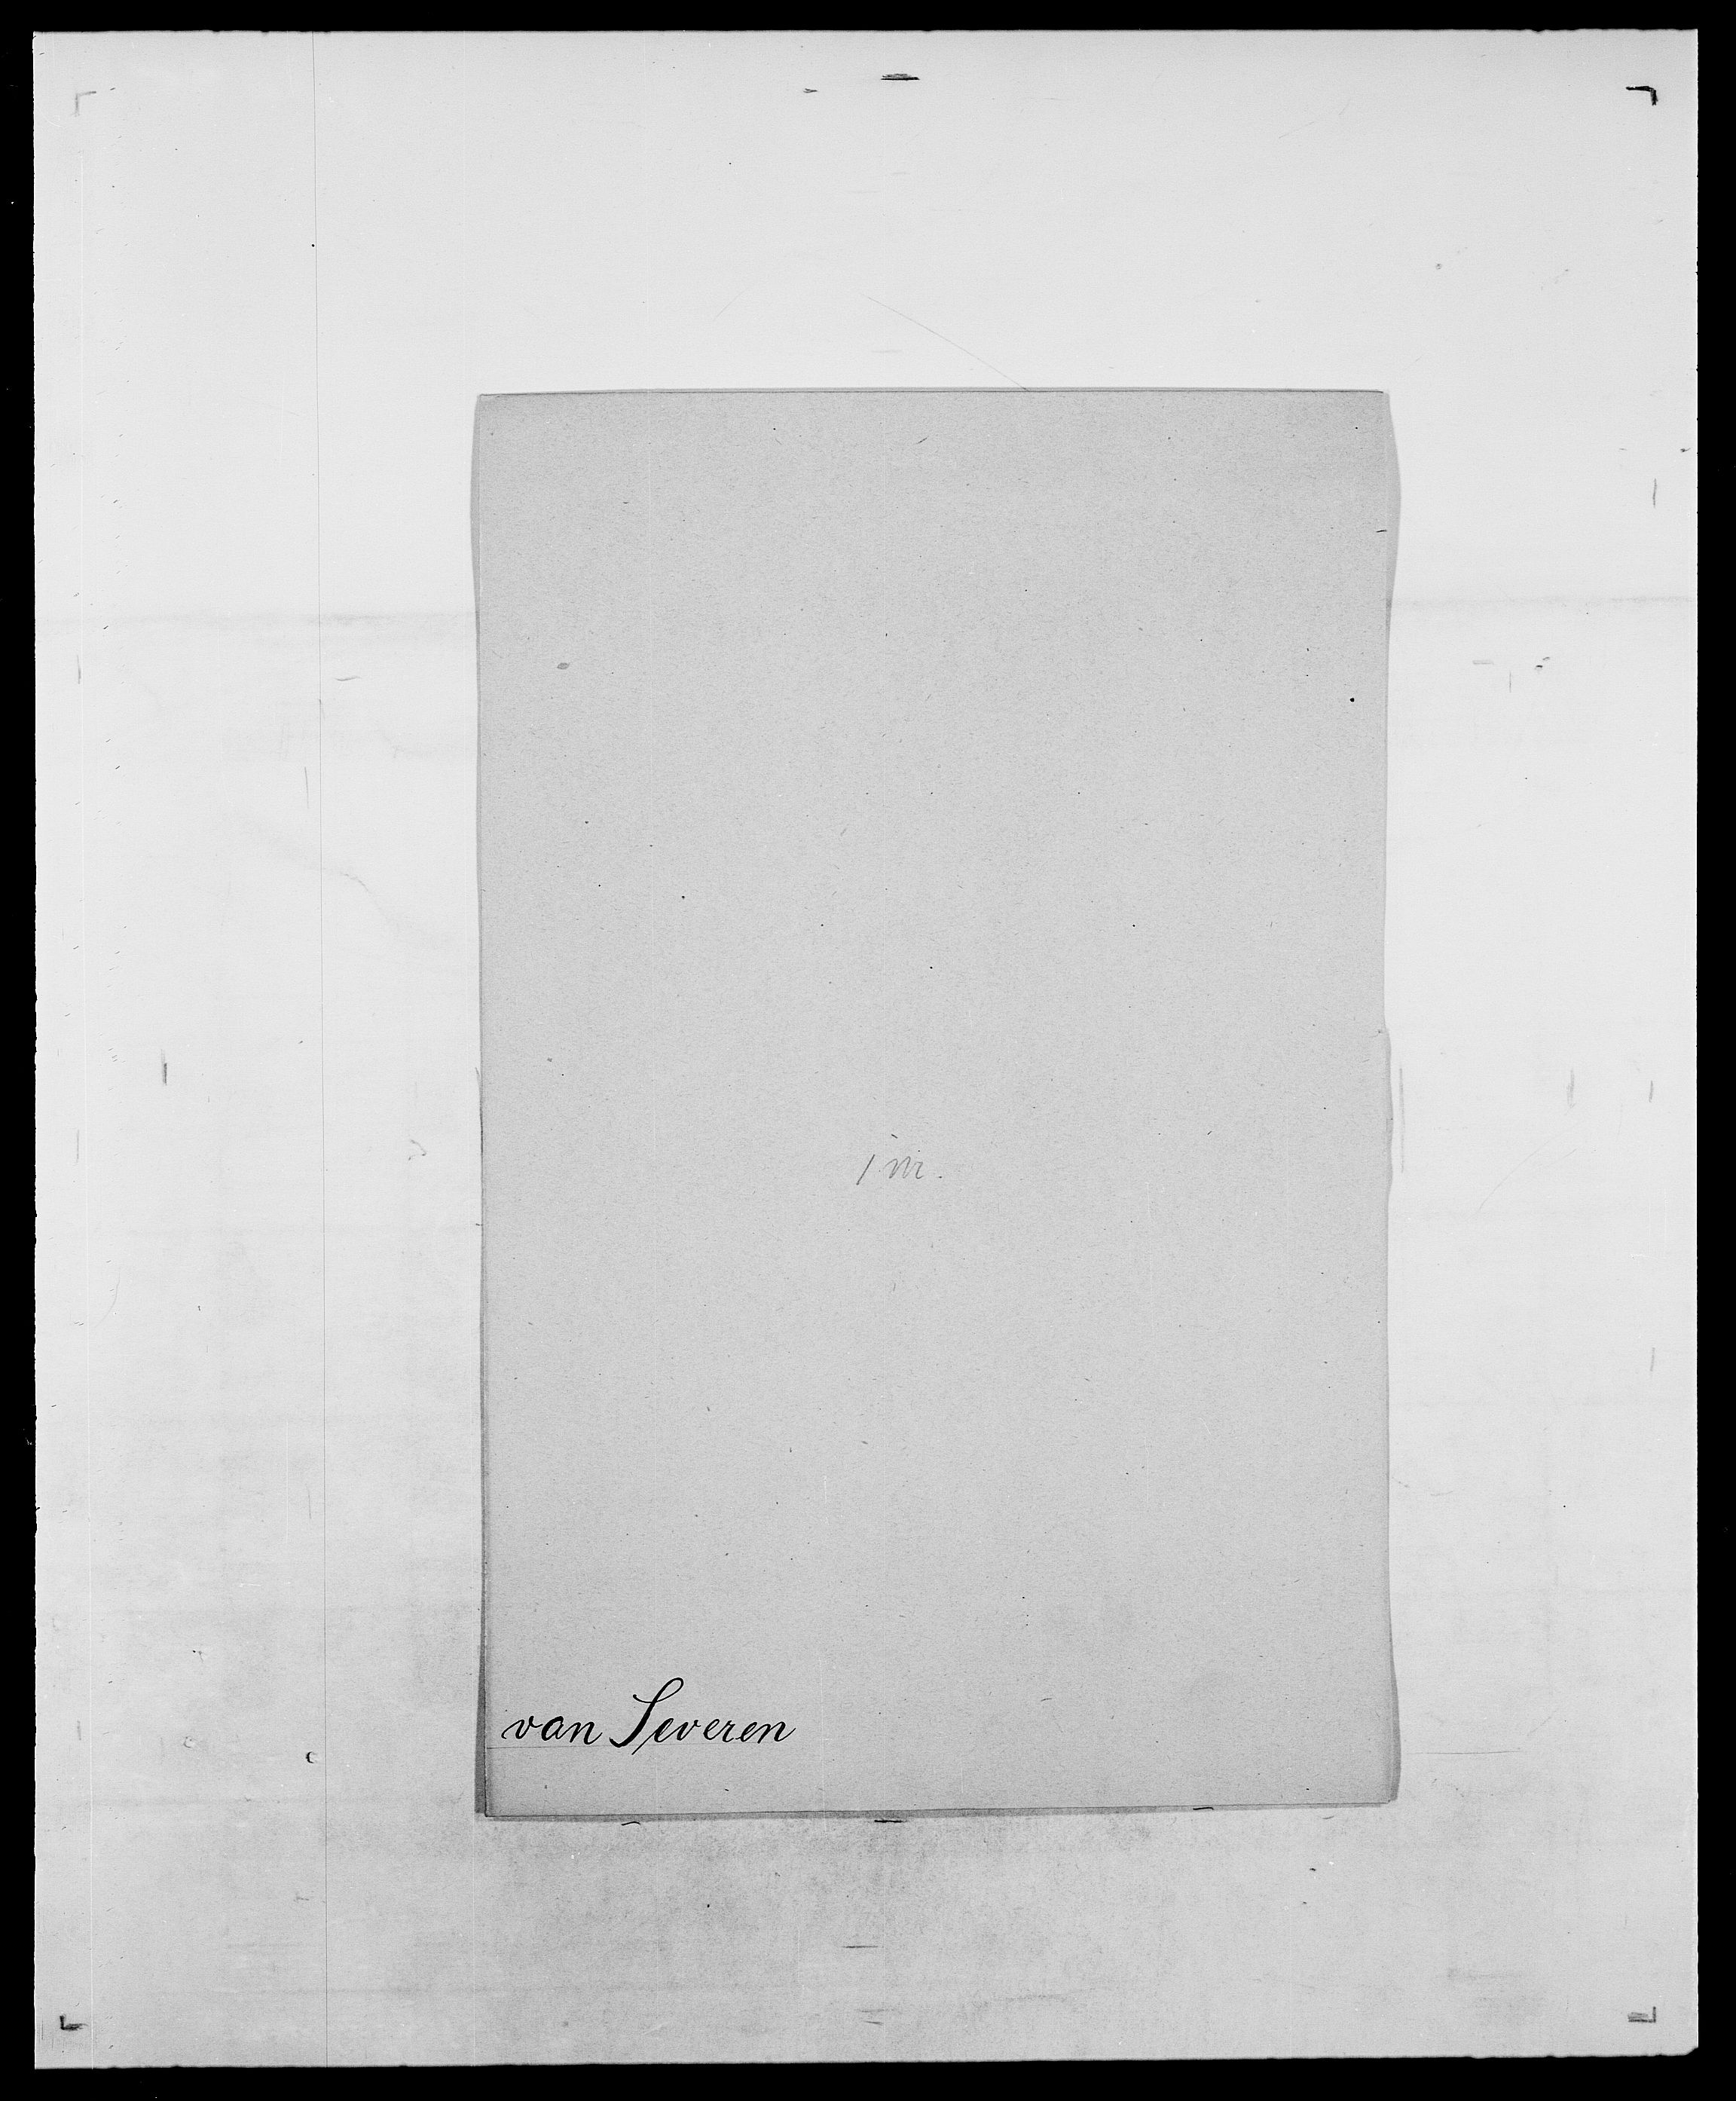 SAO, Delgobe, Charles Antoine - samling, D/Da/L0035: Schnabel - sjetman, s. 740